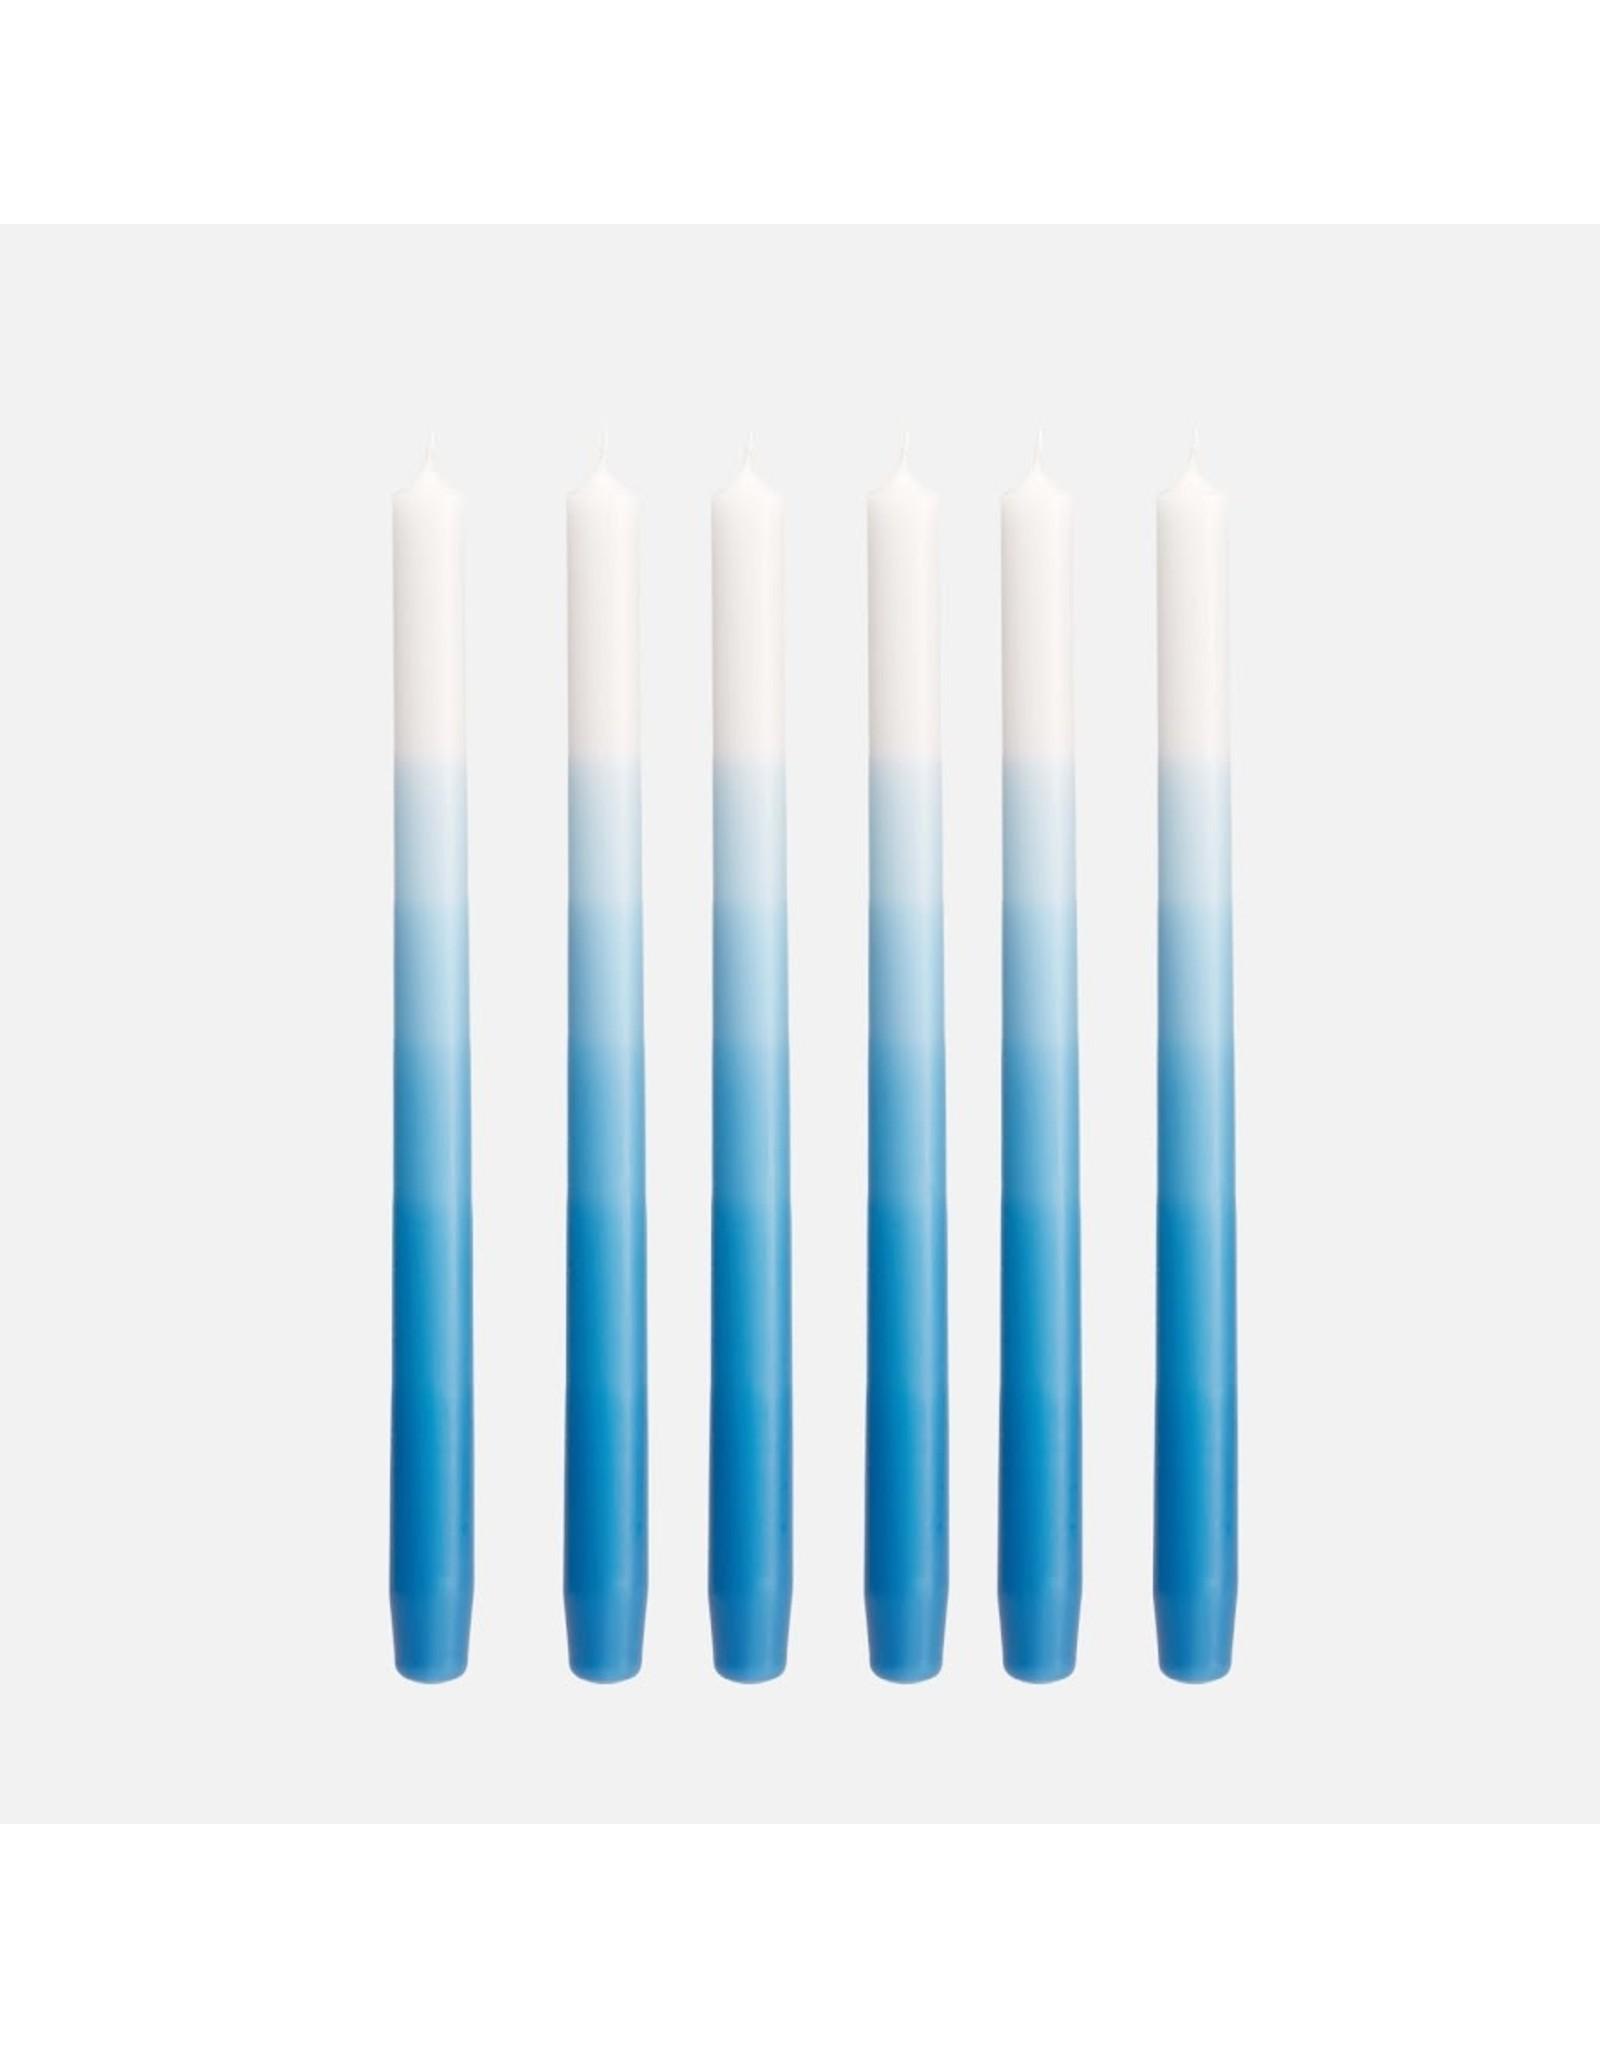 Mo Man Tai Gradient Candle (per piece)  Denim Blue